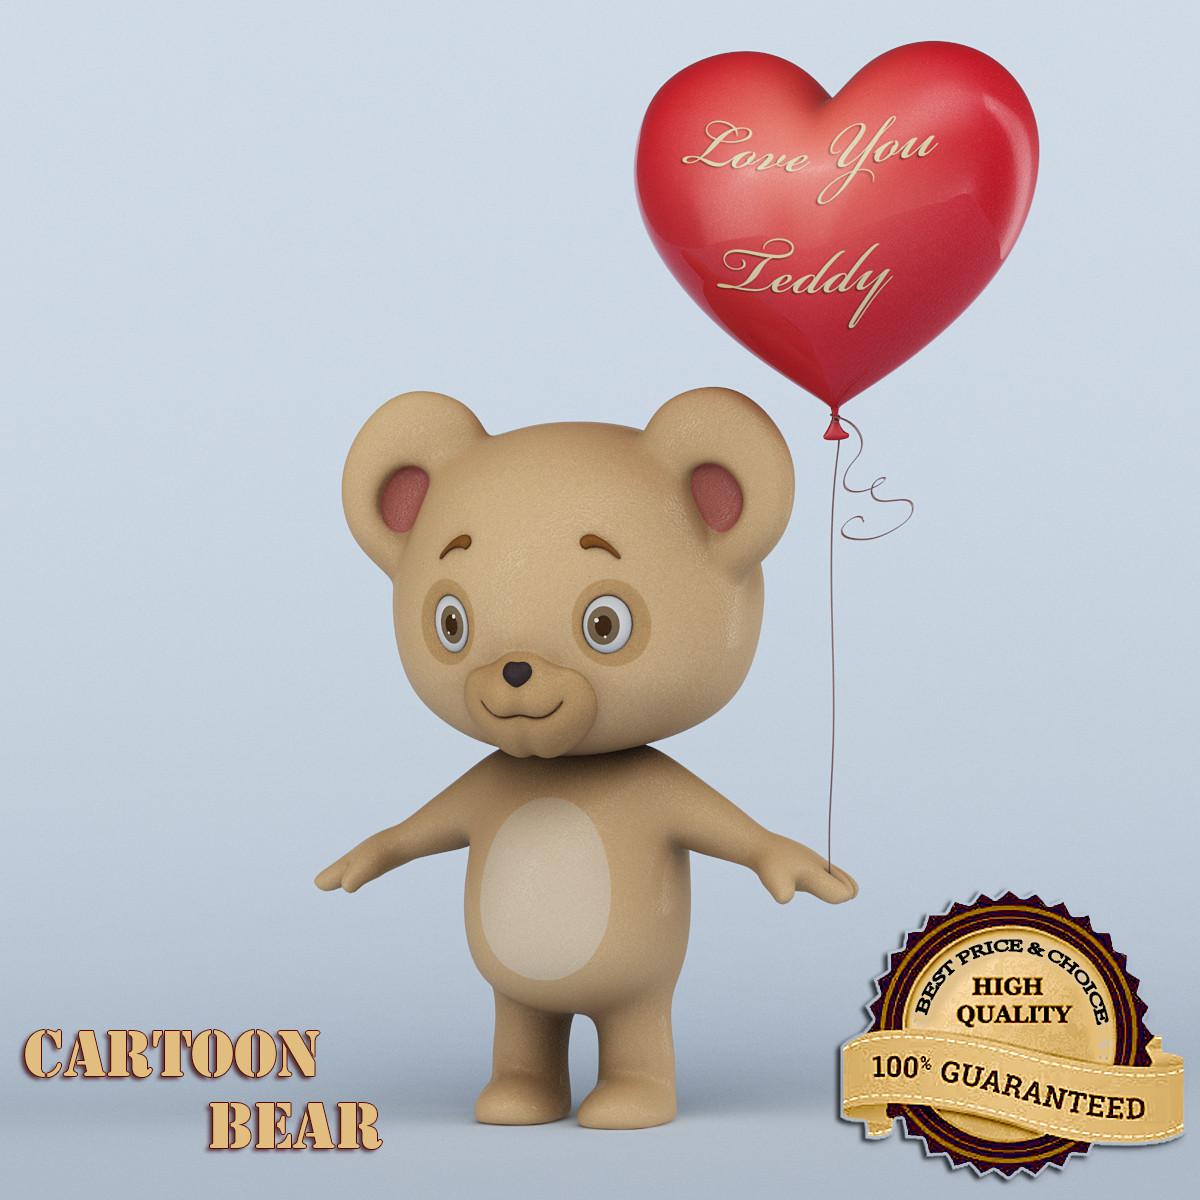 013_Cartoon bear.jpg